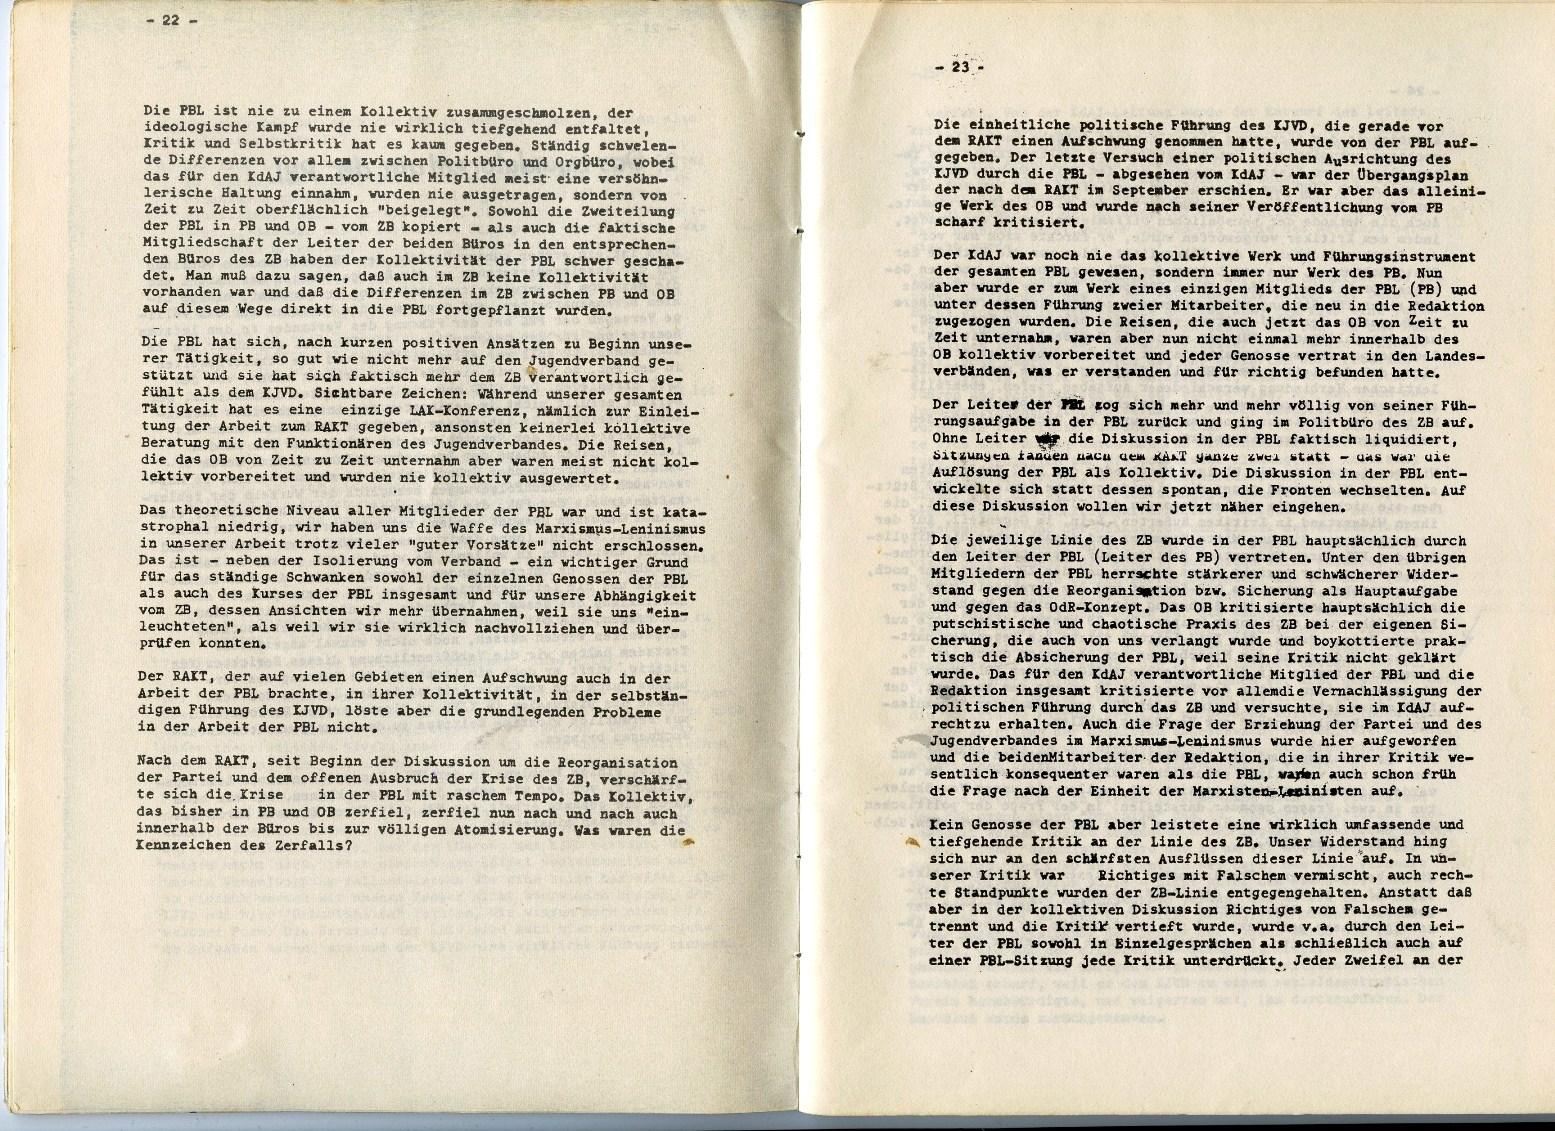 ZB_Universitas_1972_15